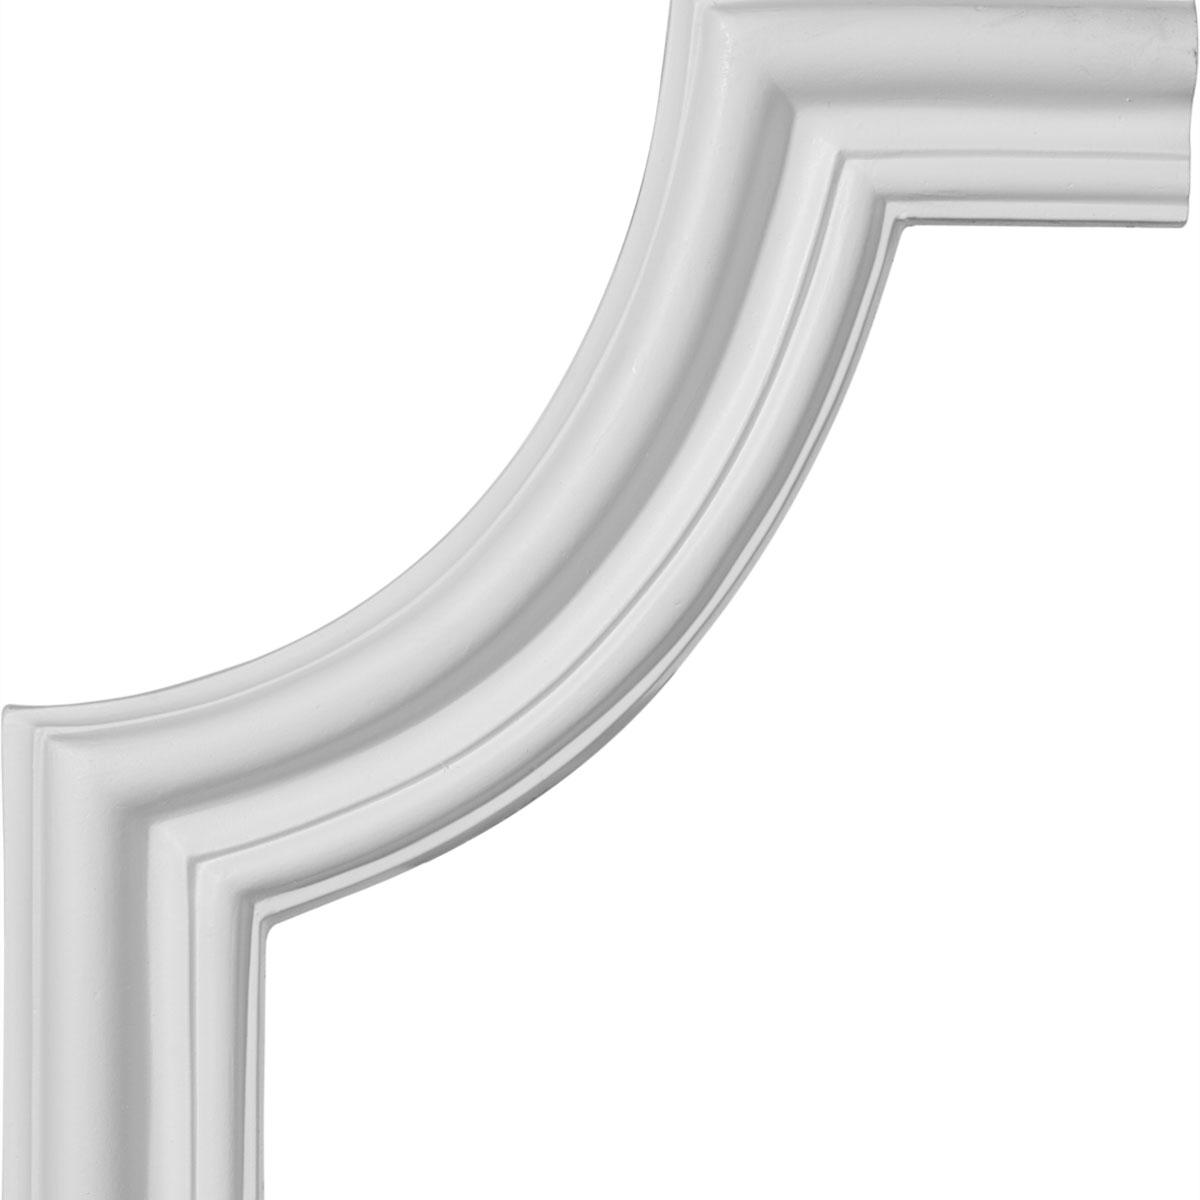 Ekena millwork polyurethane panel moulding corner 10in for Polyurethane millwork